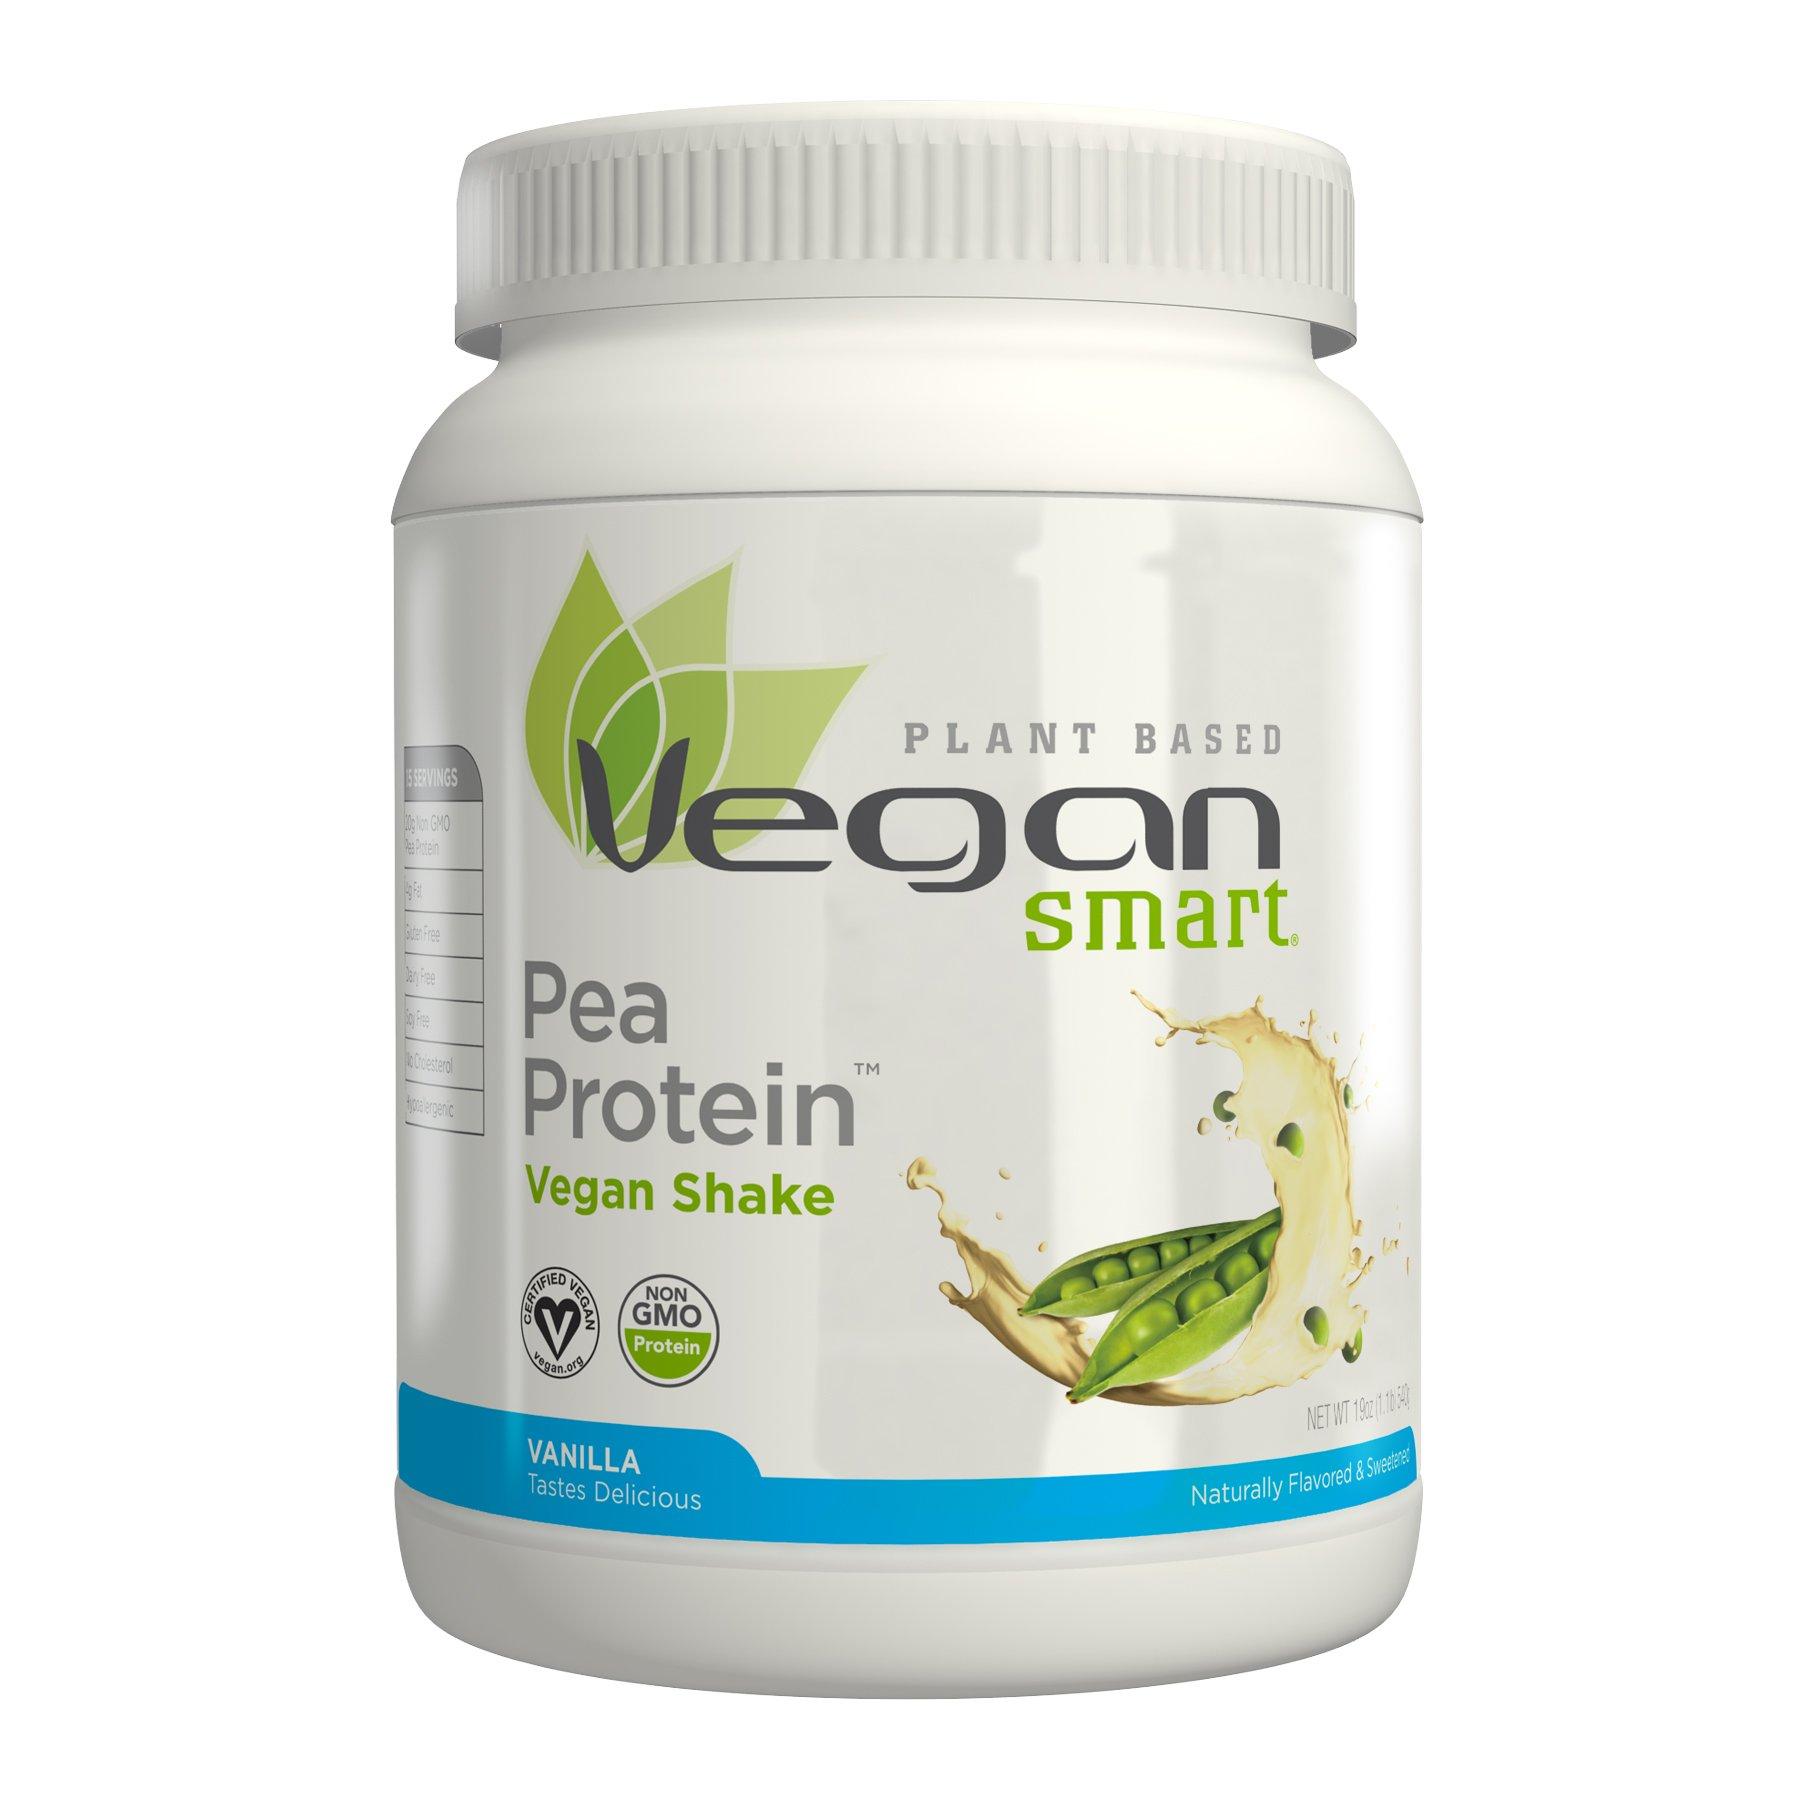 Naturade Plant Based VeganSmart Pea Protein – Vanilla – 20.63 oz